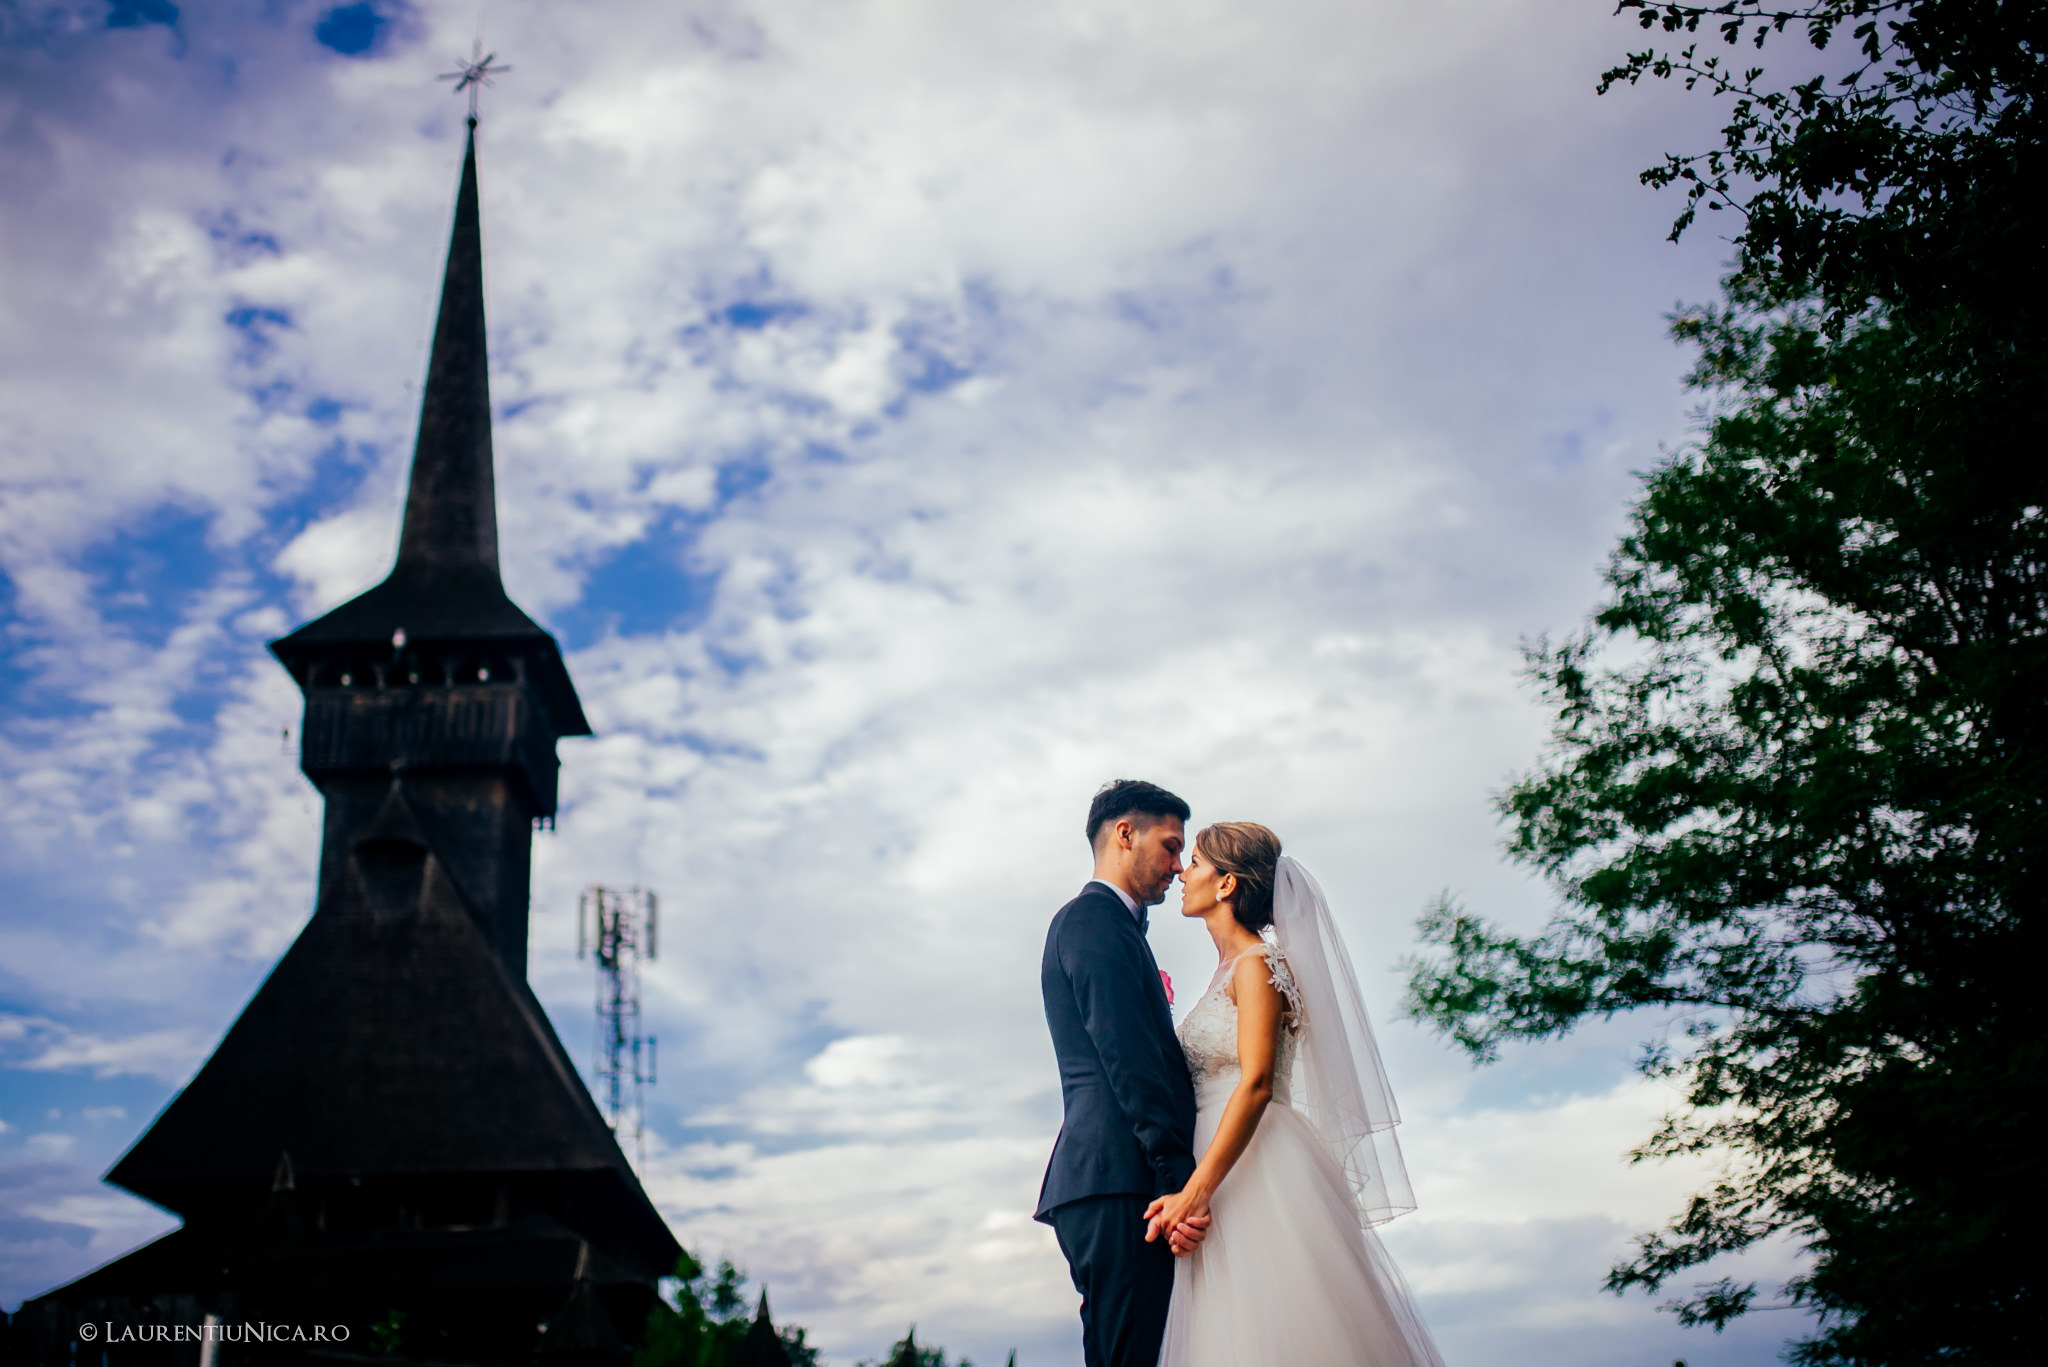 madalina madalin fotograf nunta laurentiu nica turceni gorj 28 - Madalina & Madalin | Fotografii nunta | Judetul Gorj